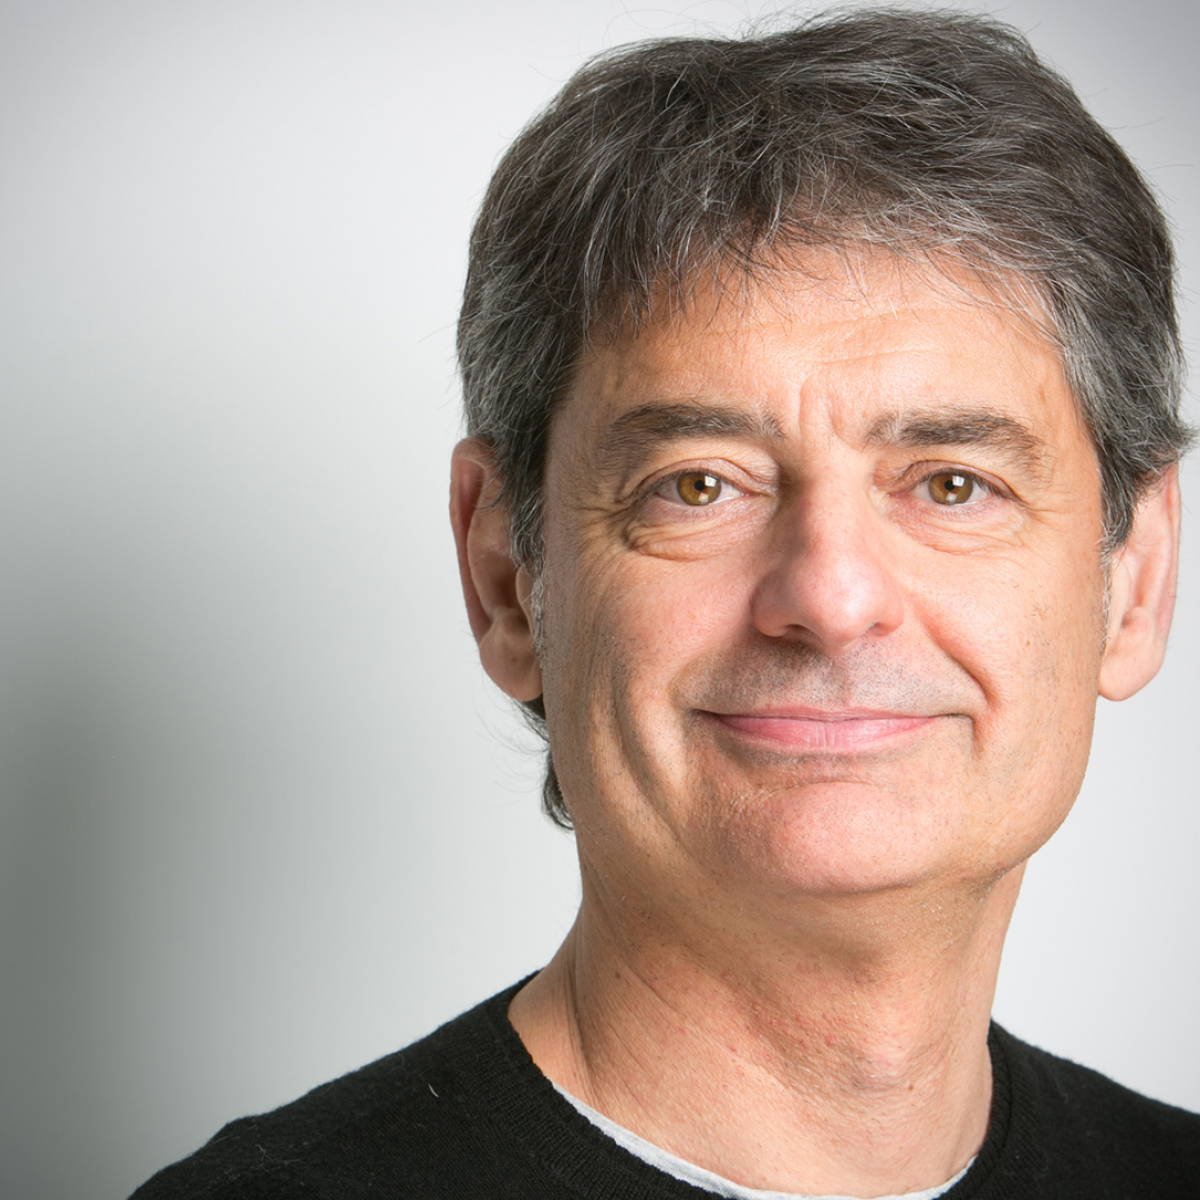 Gerard-LOPEZ-bva